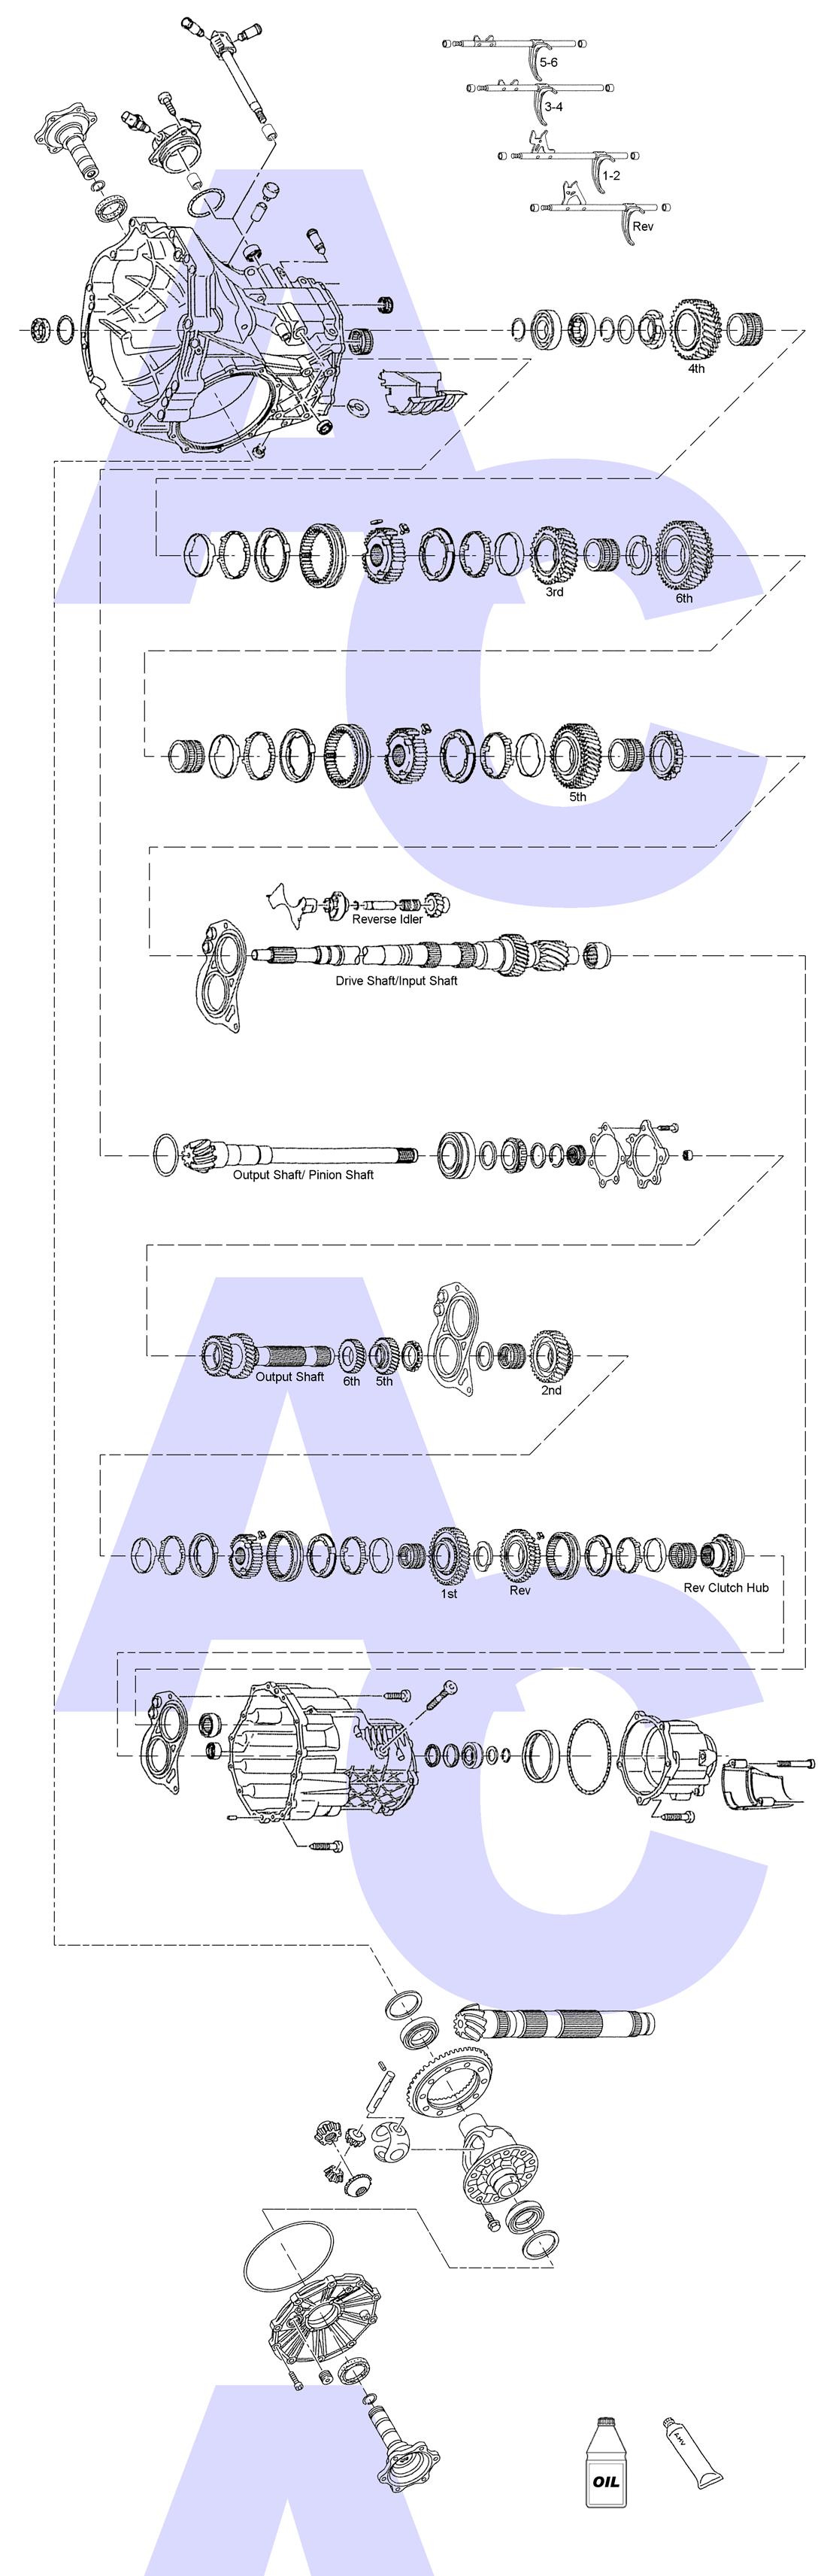 Insight map creator manual transmission